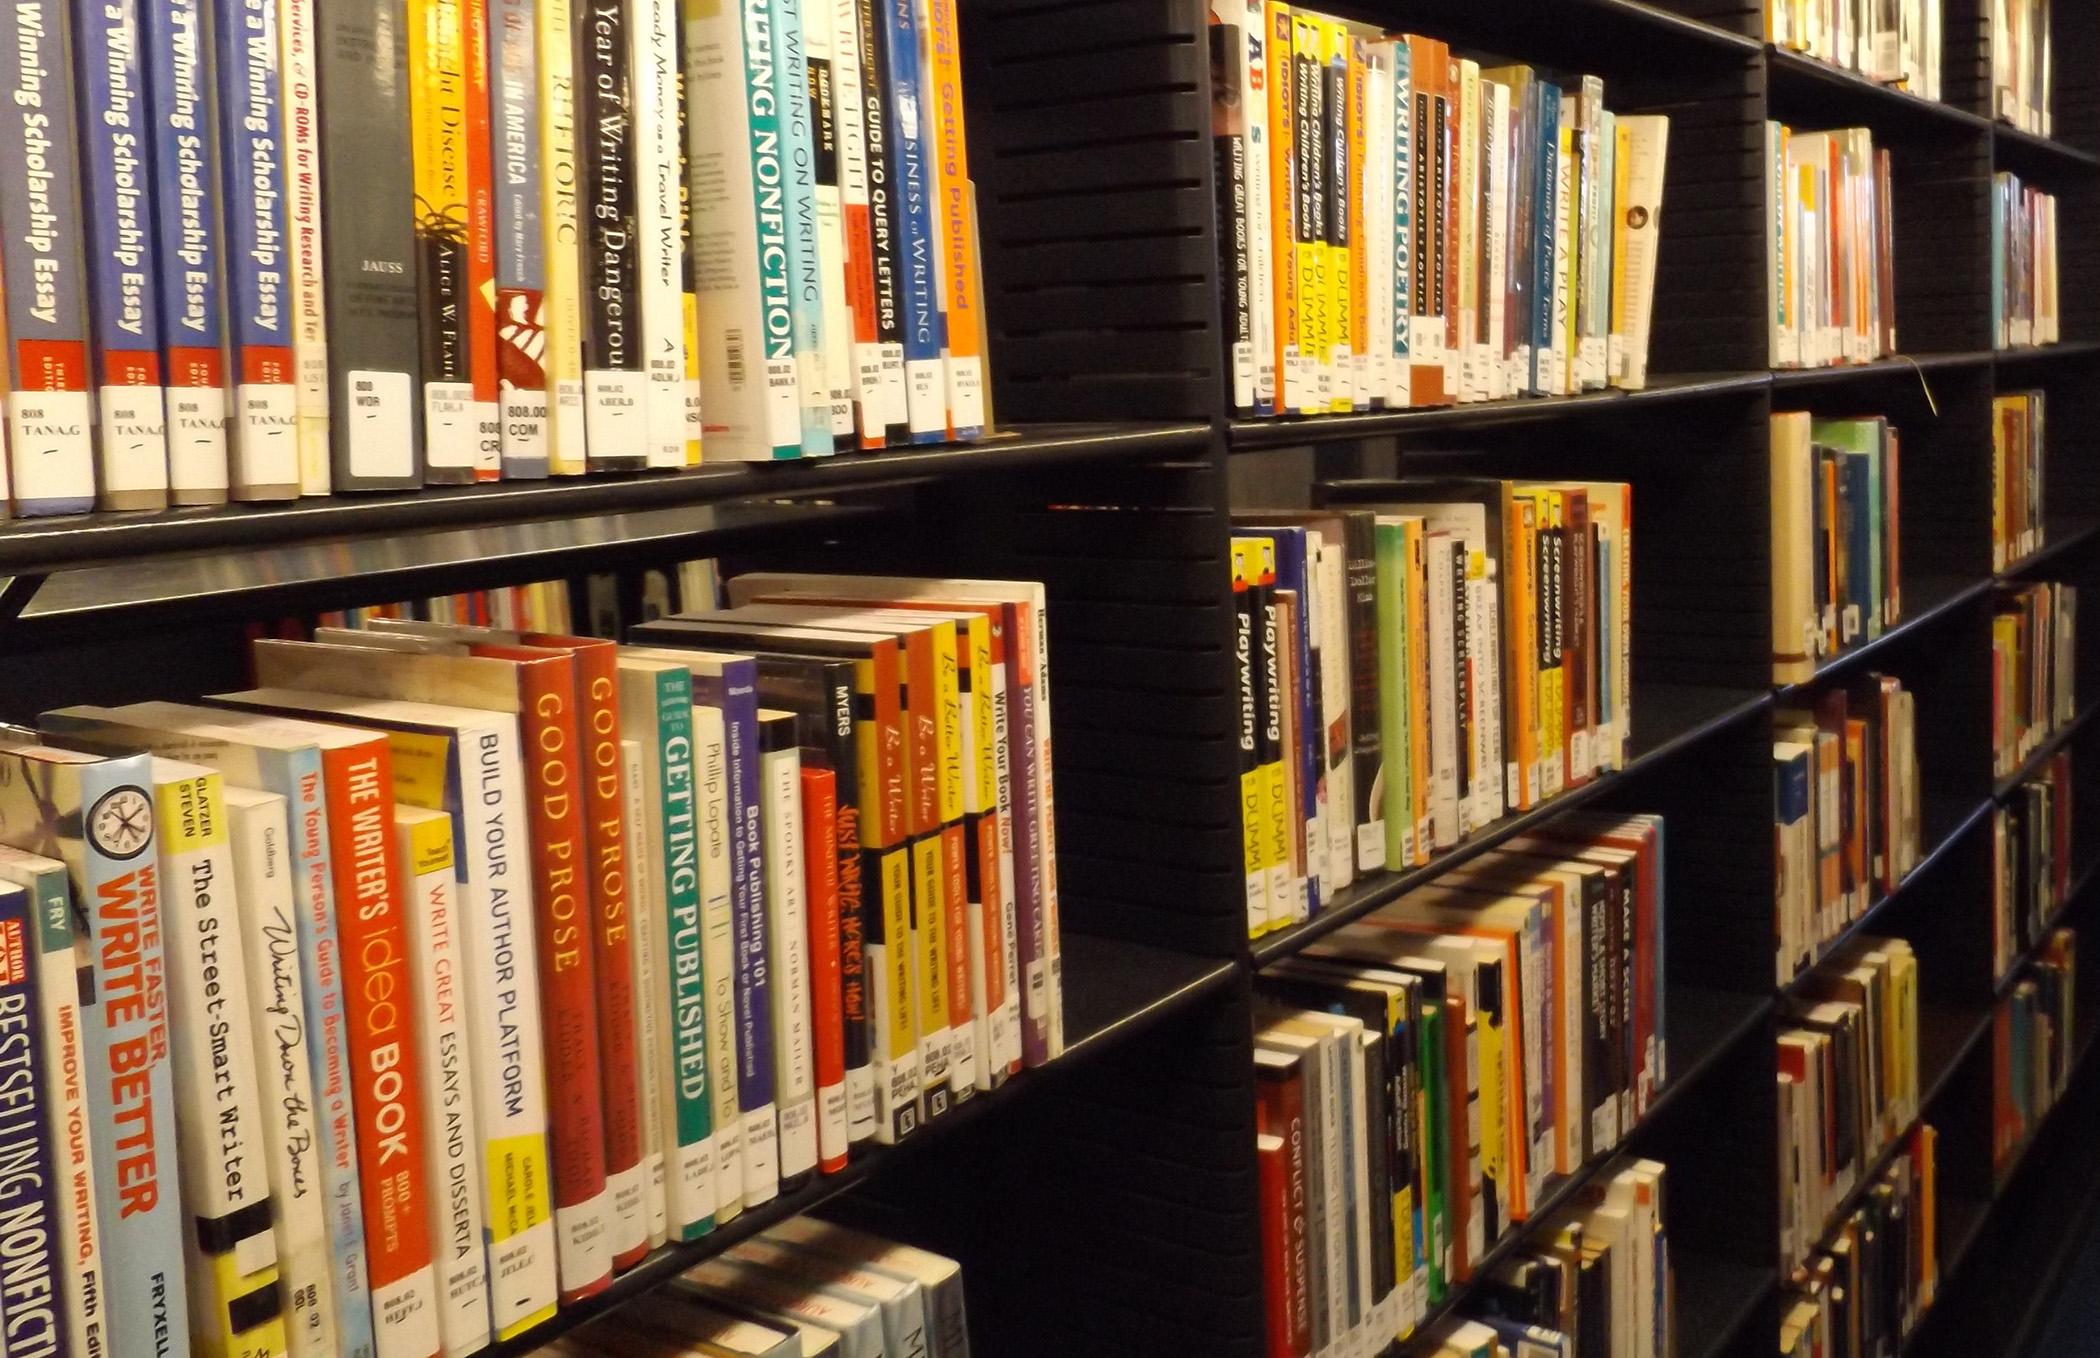 Peoria Public Library System